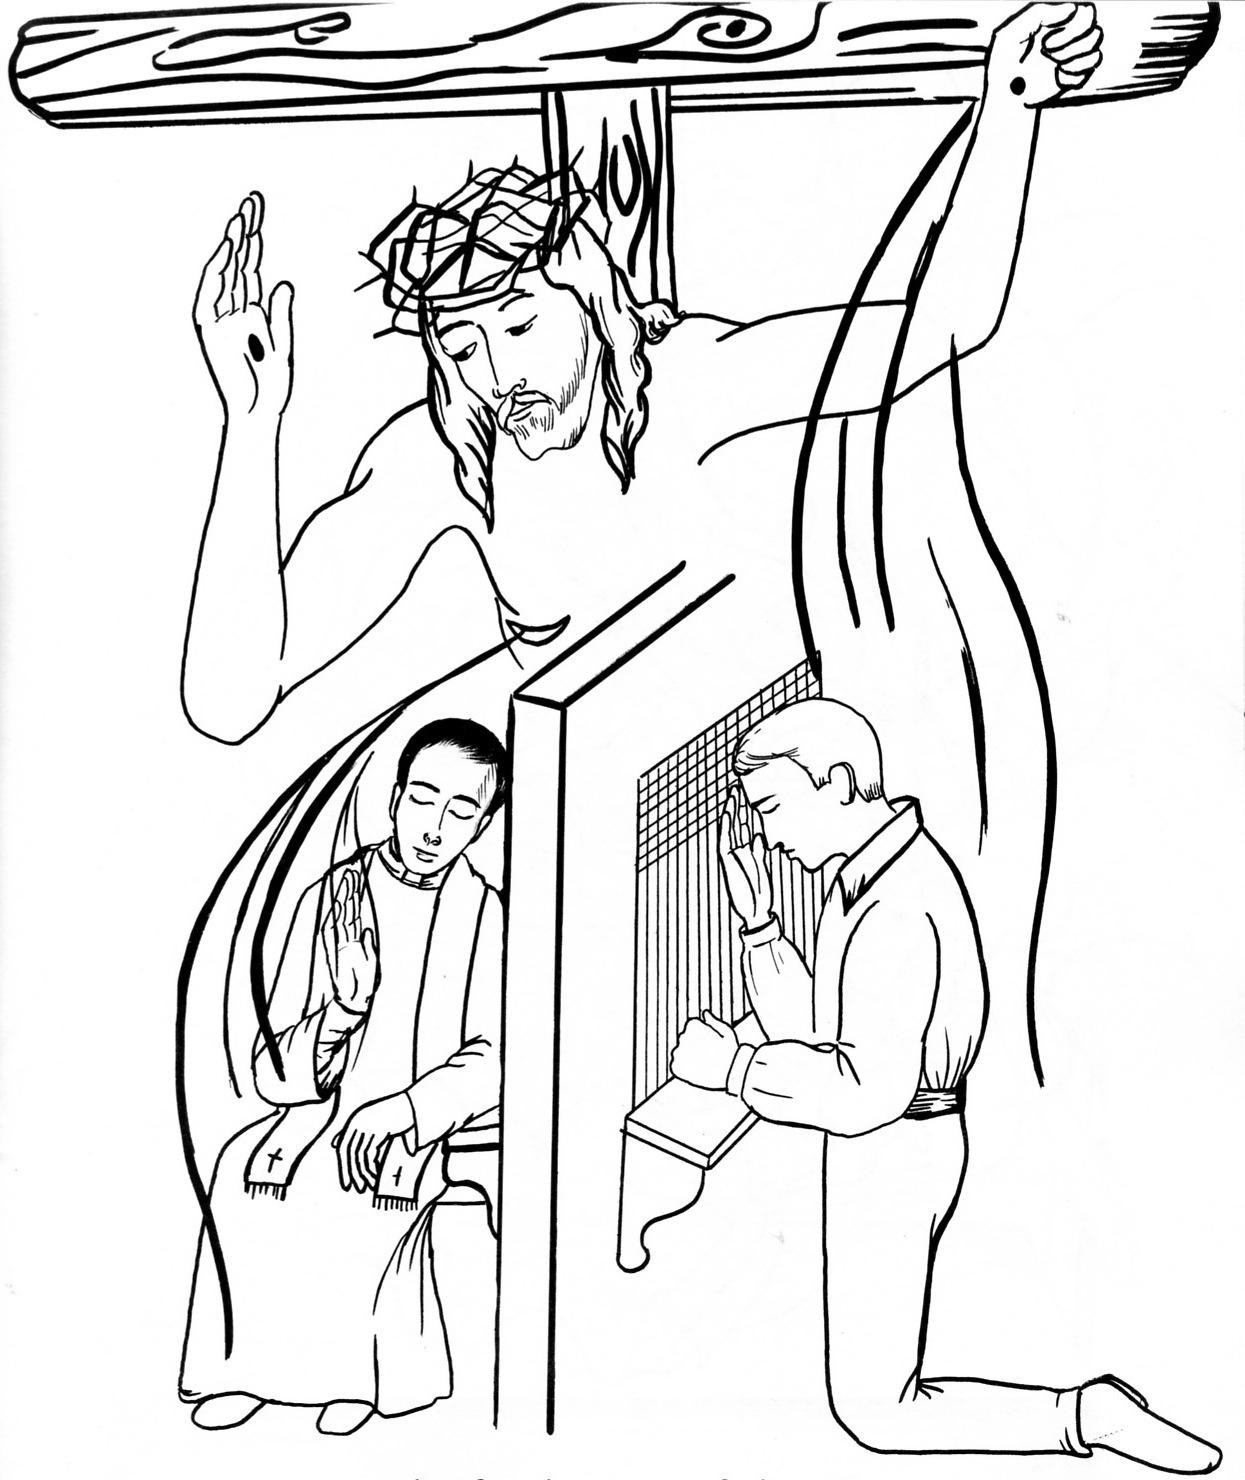 Coloring pages 7 sacraments - Coloring Pages 7 Sacraments 46